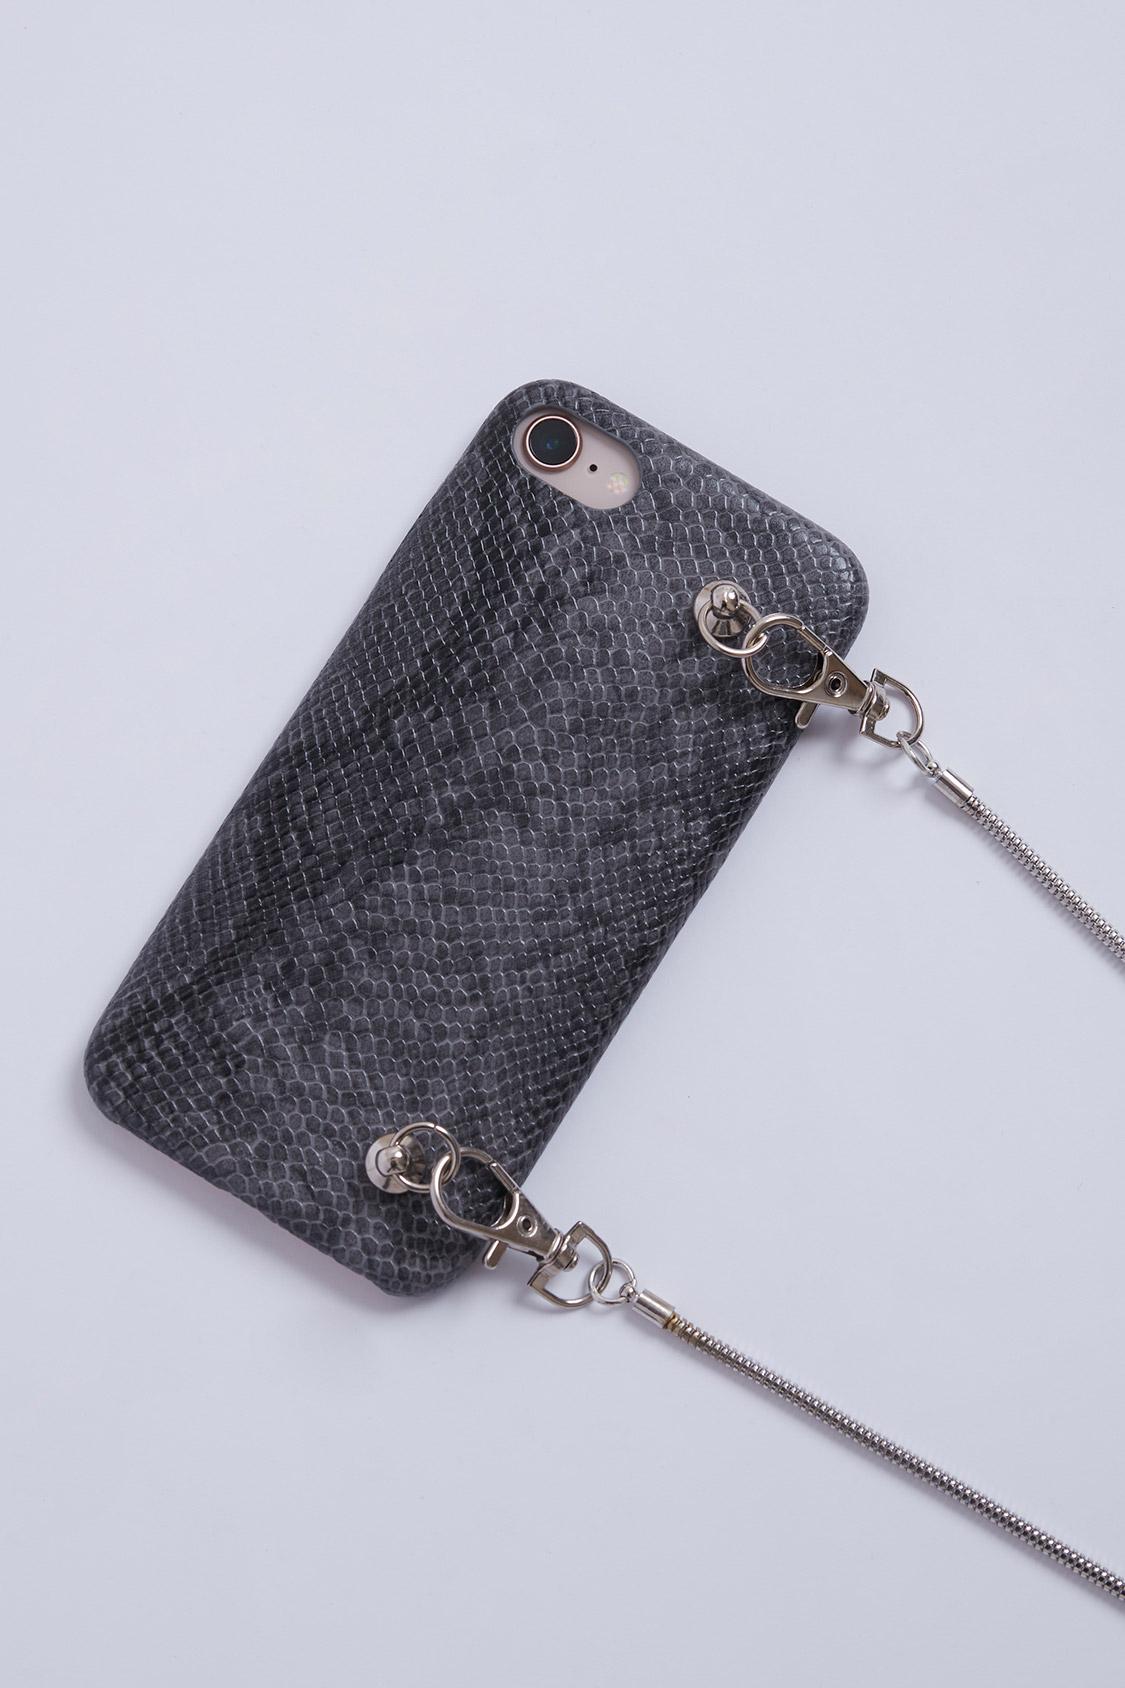 Funda cadena - Iphone 7/8